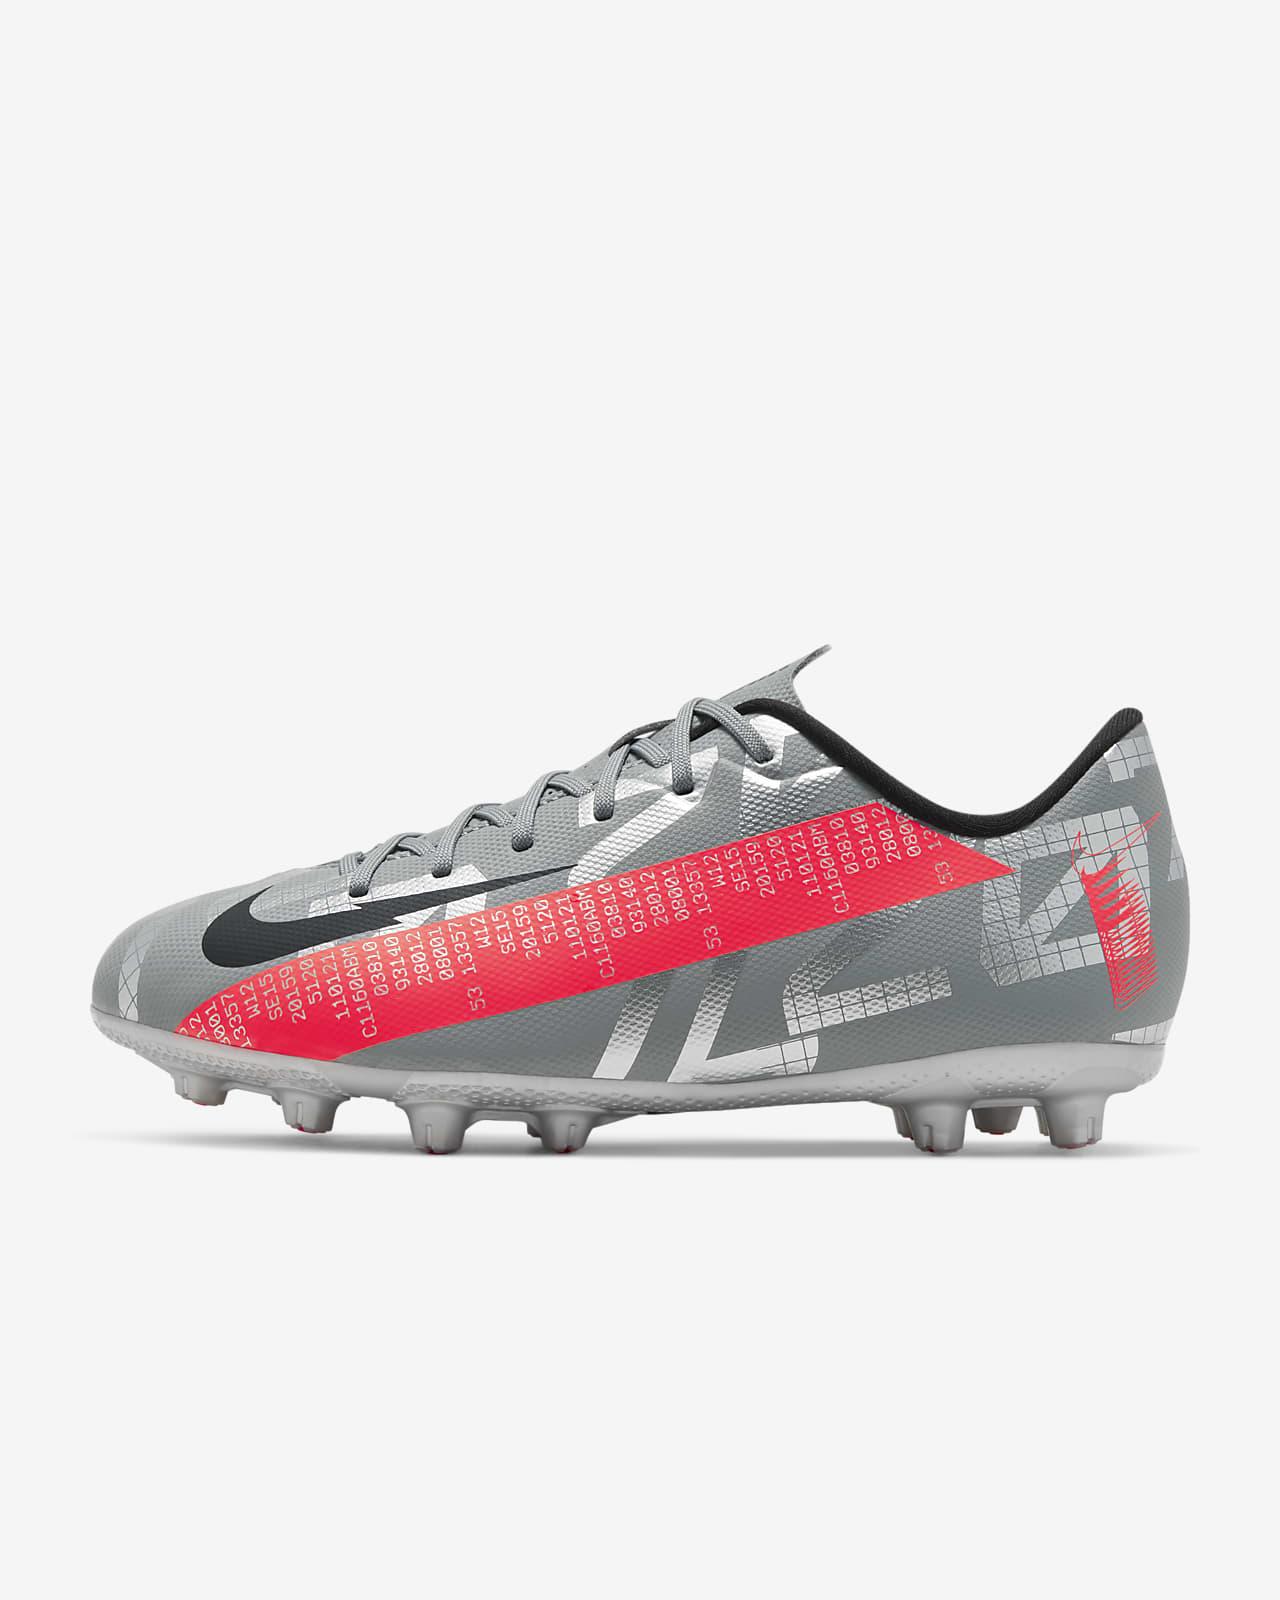 Nike Jr. Mercurial Vapor 13 Academy HG Hard-Ground Soccer Cleat